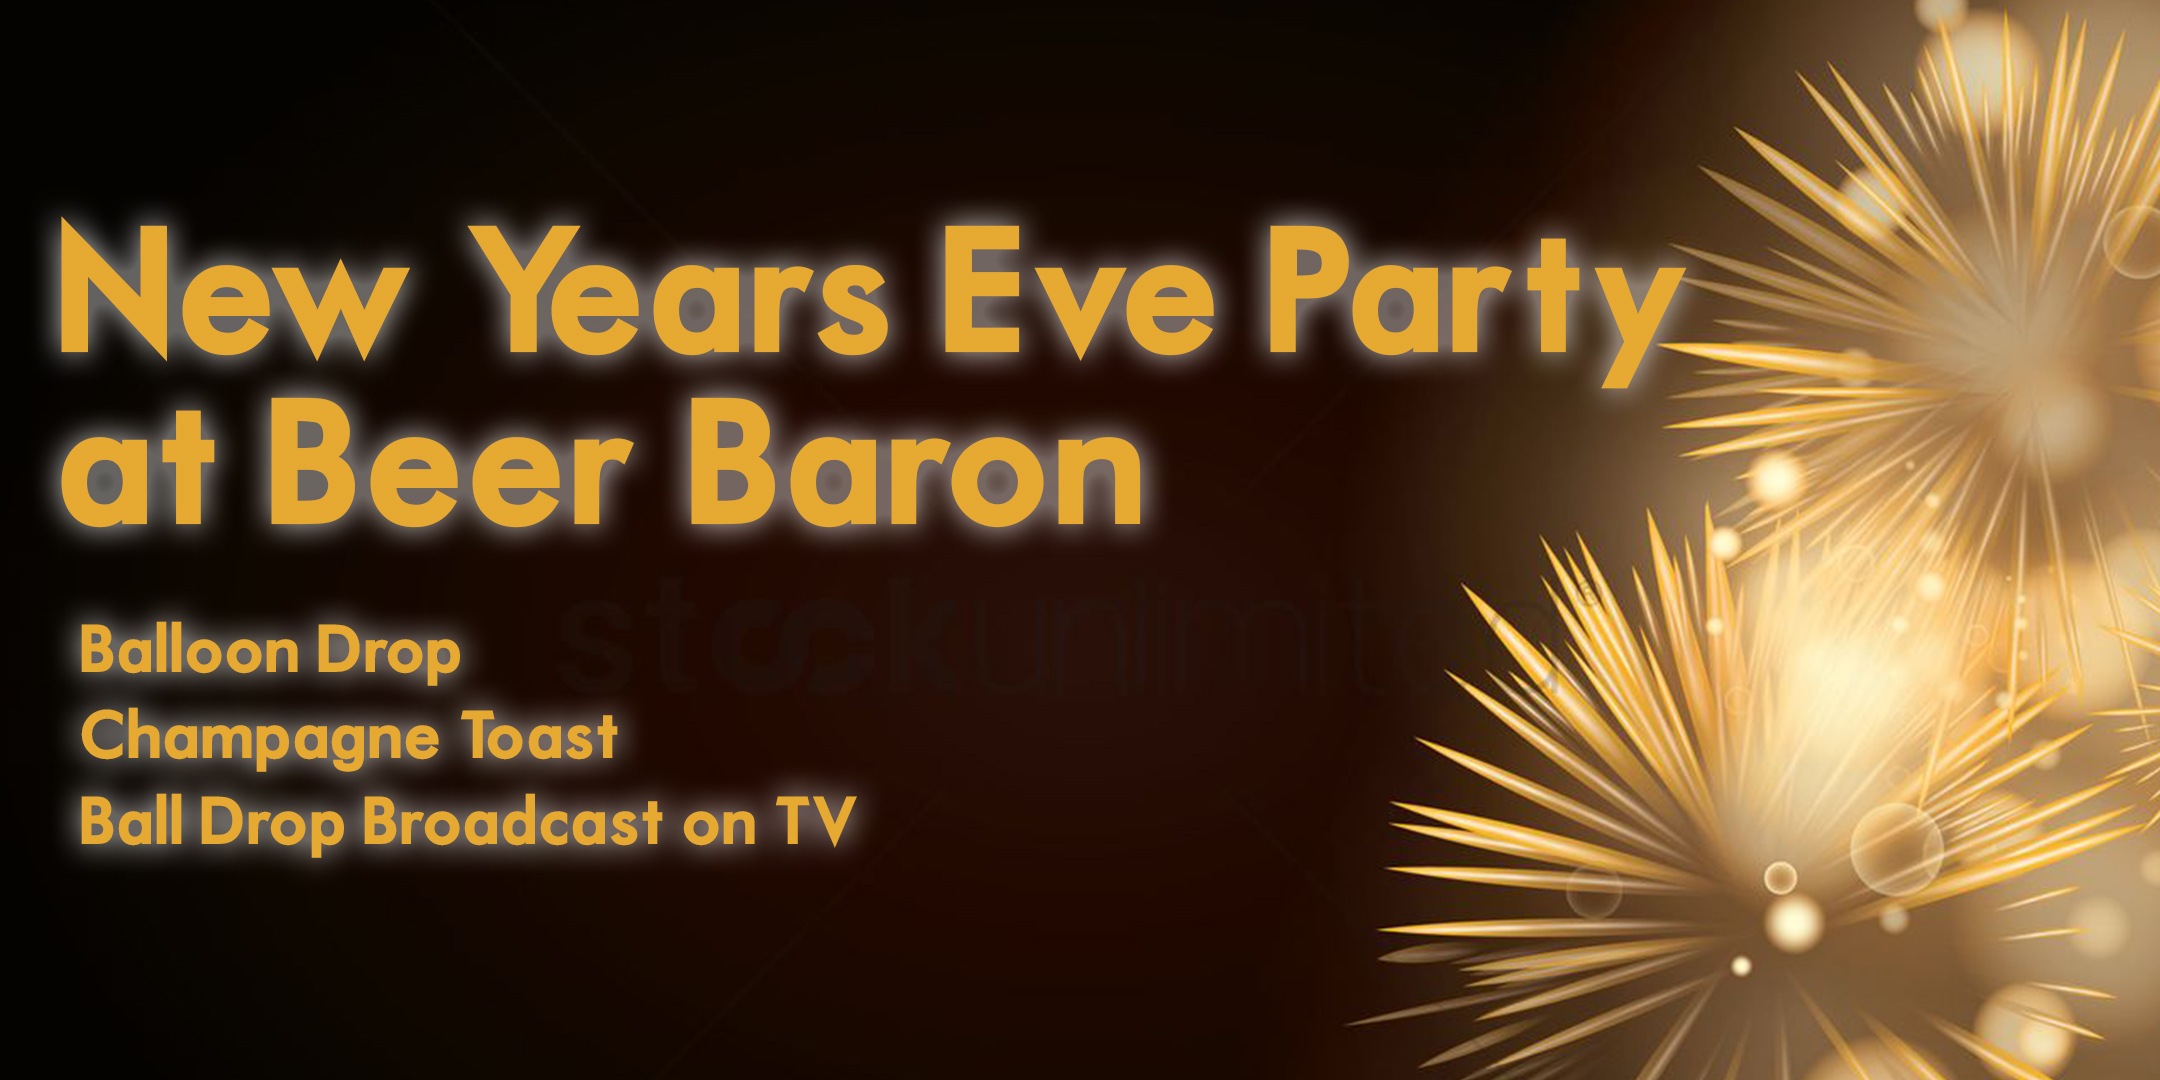 Beer Baron New Years Eventbrite photo.jpg